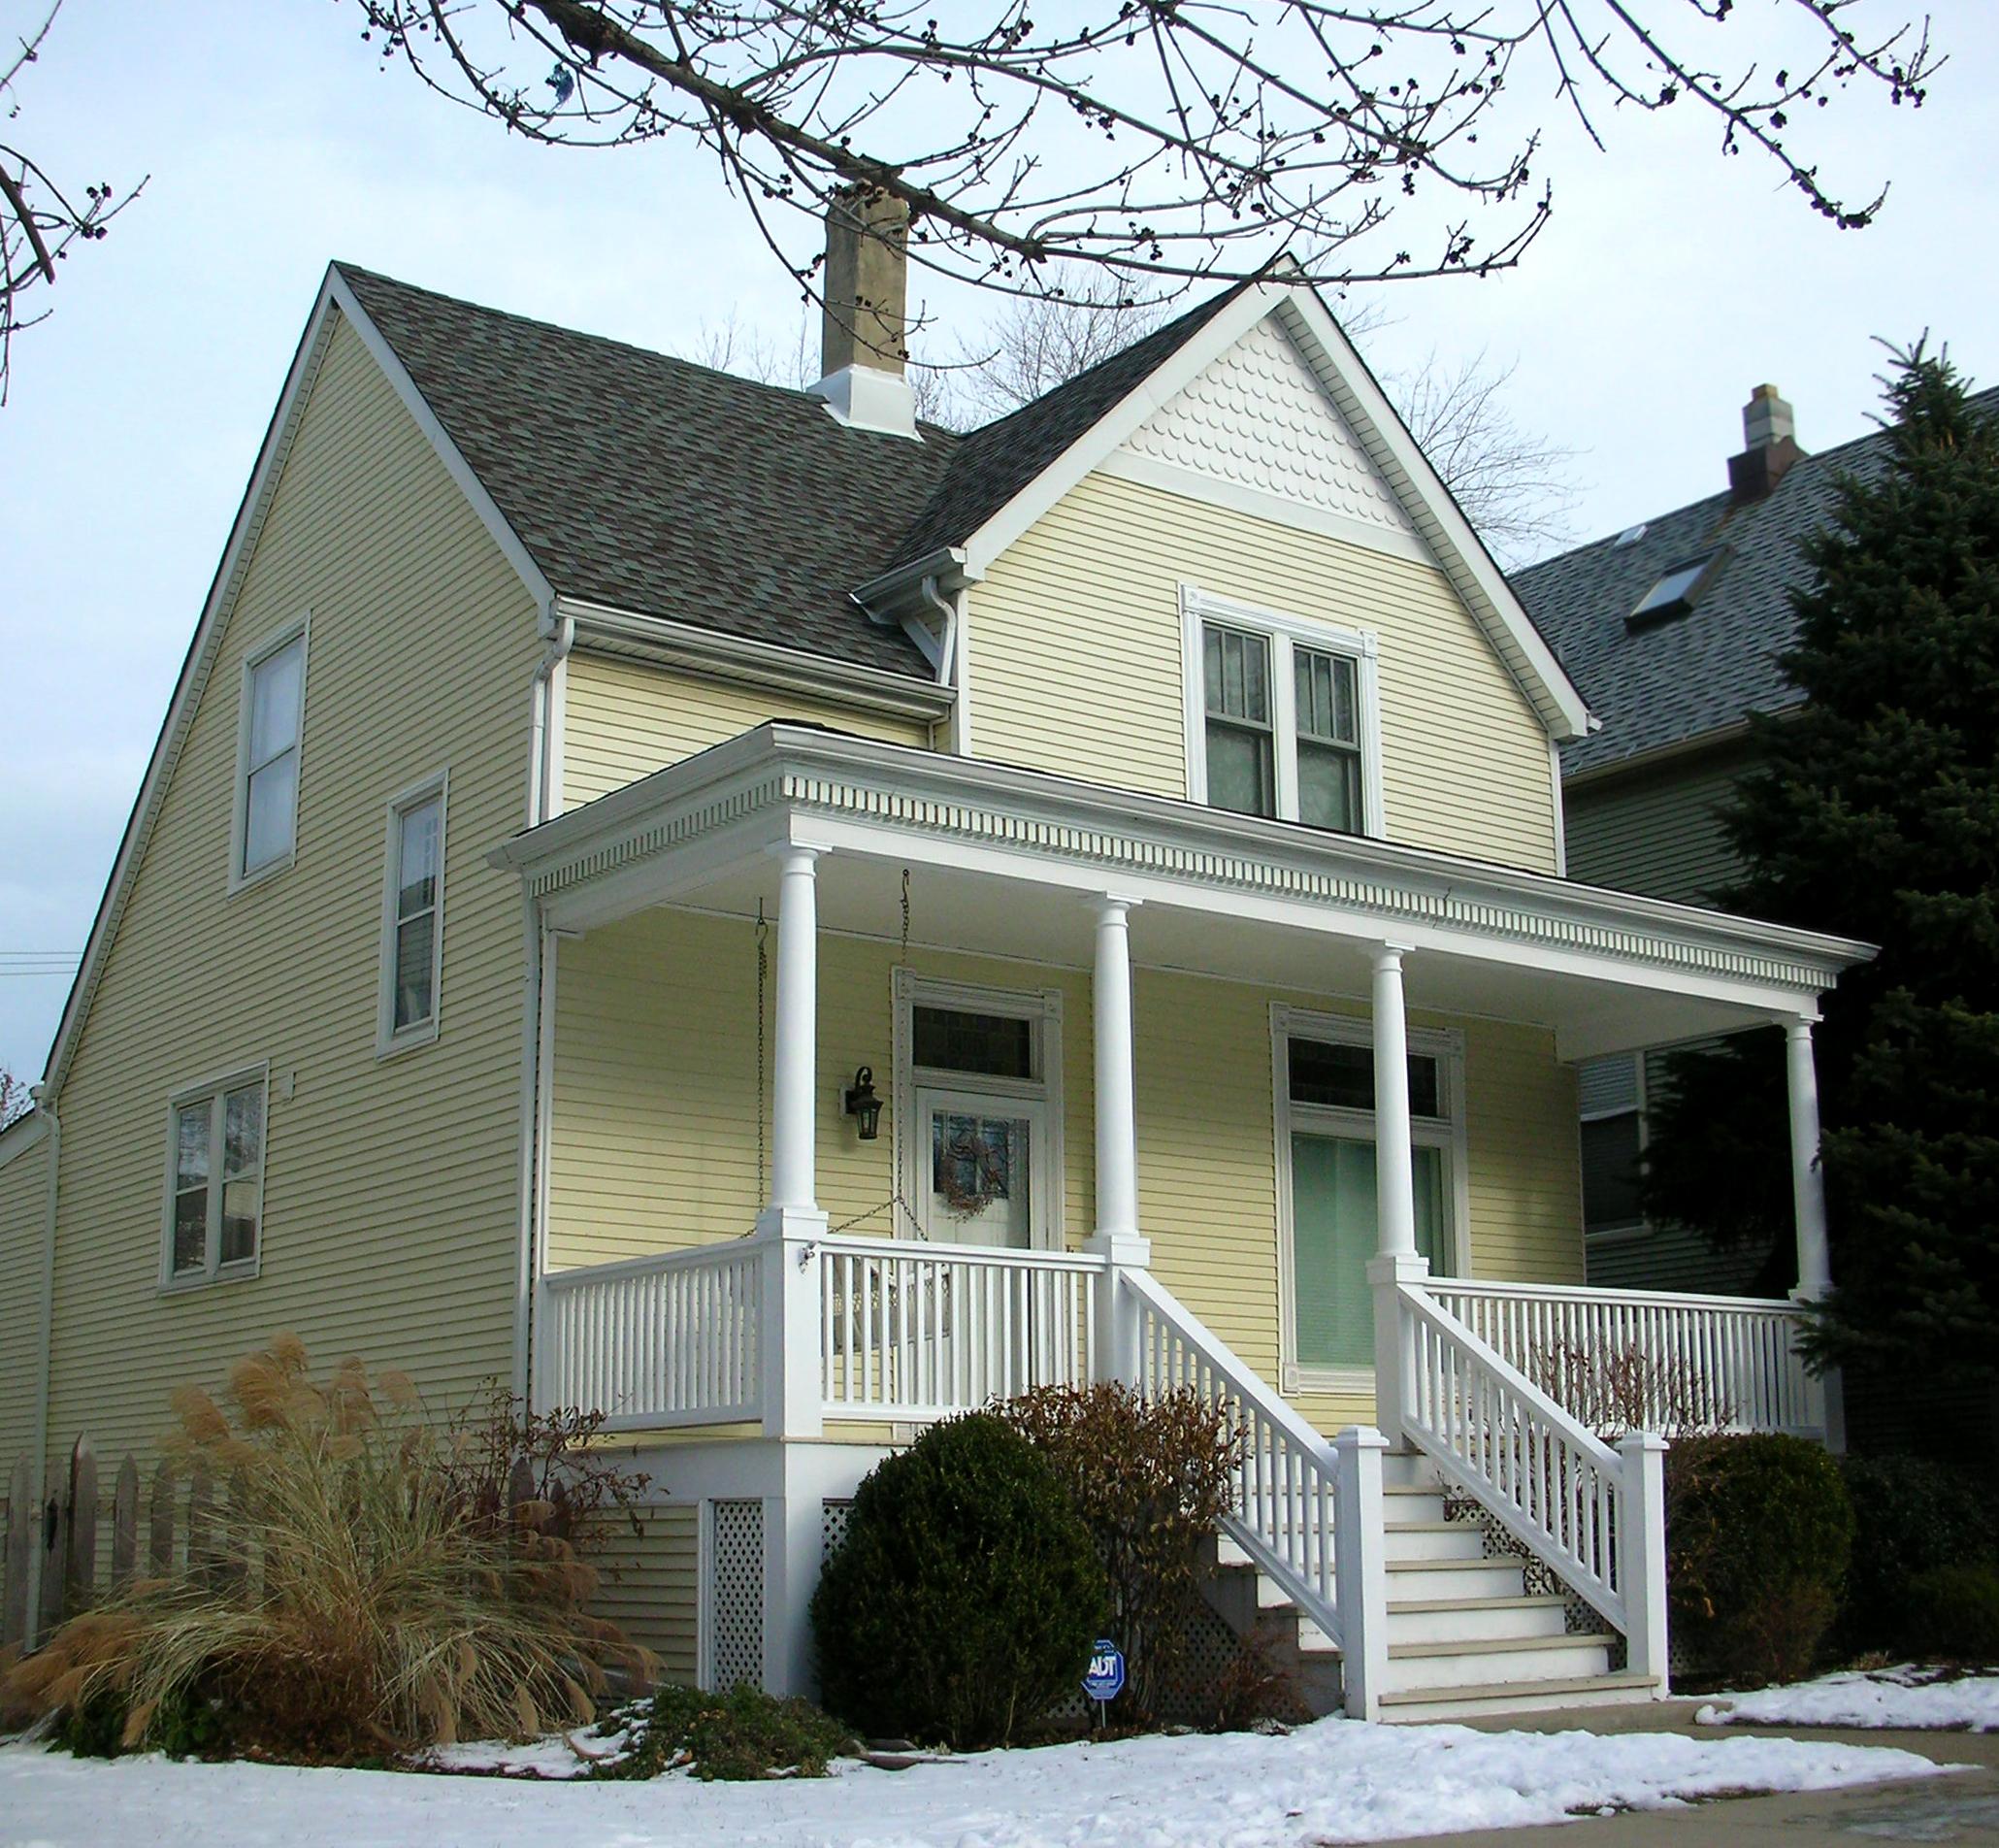 custom residential renovation redesign porch deck, front door, entrance